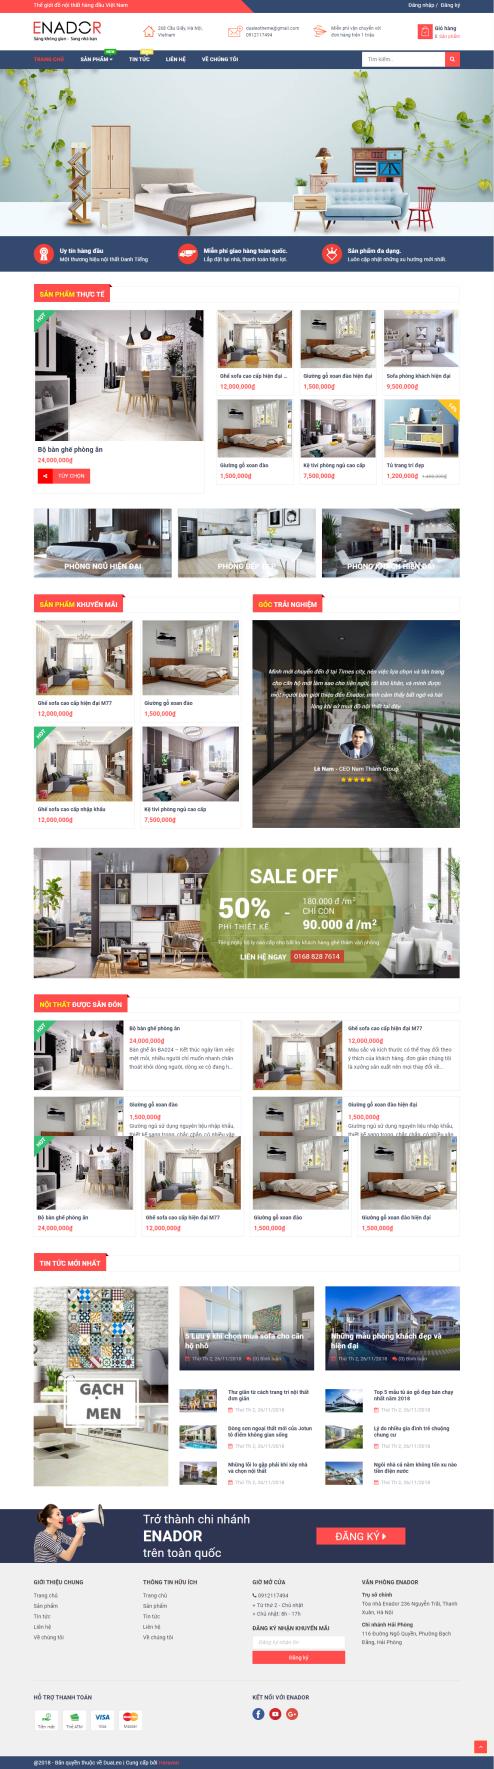 Thiết kế Mẫu website kiến trúc nội thất KTNT23